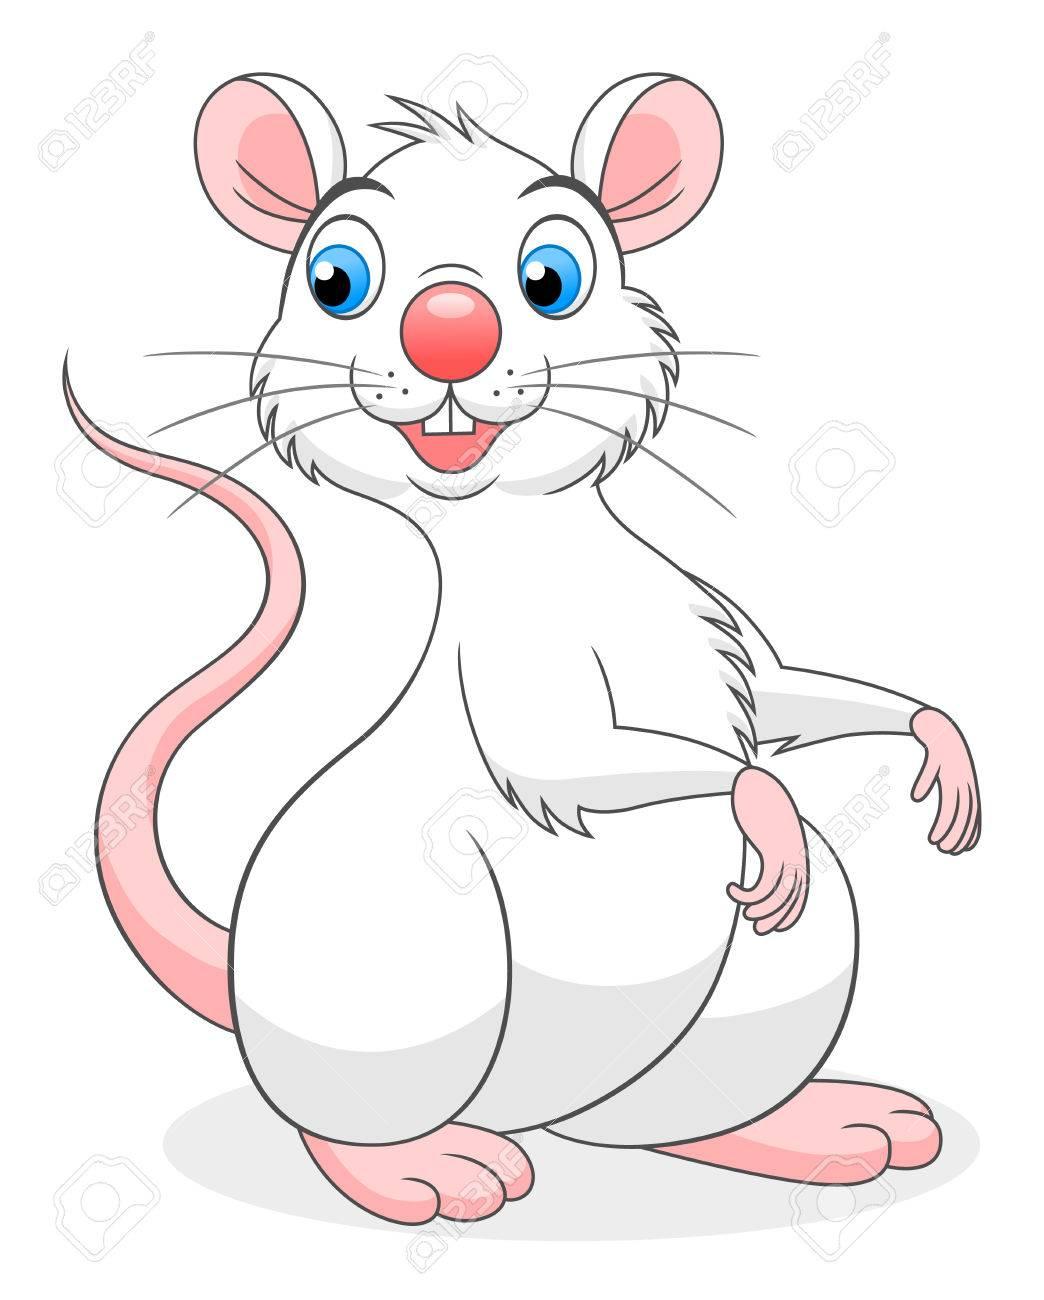 1044x1300 Cartoon Cute Rat Royalty Free Cliparts, Vectors, And Stock